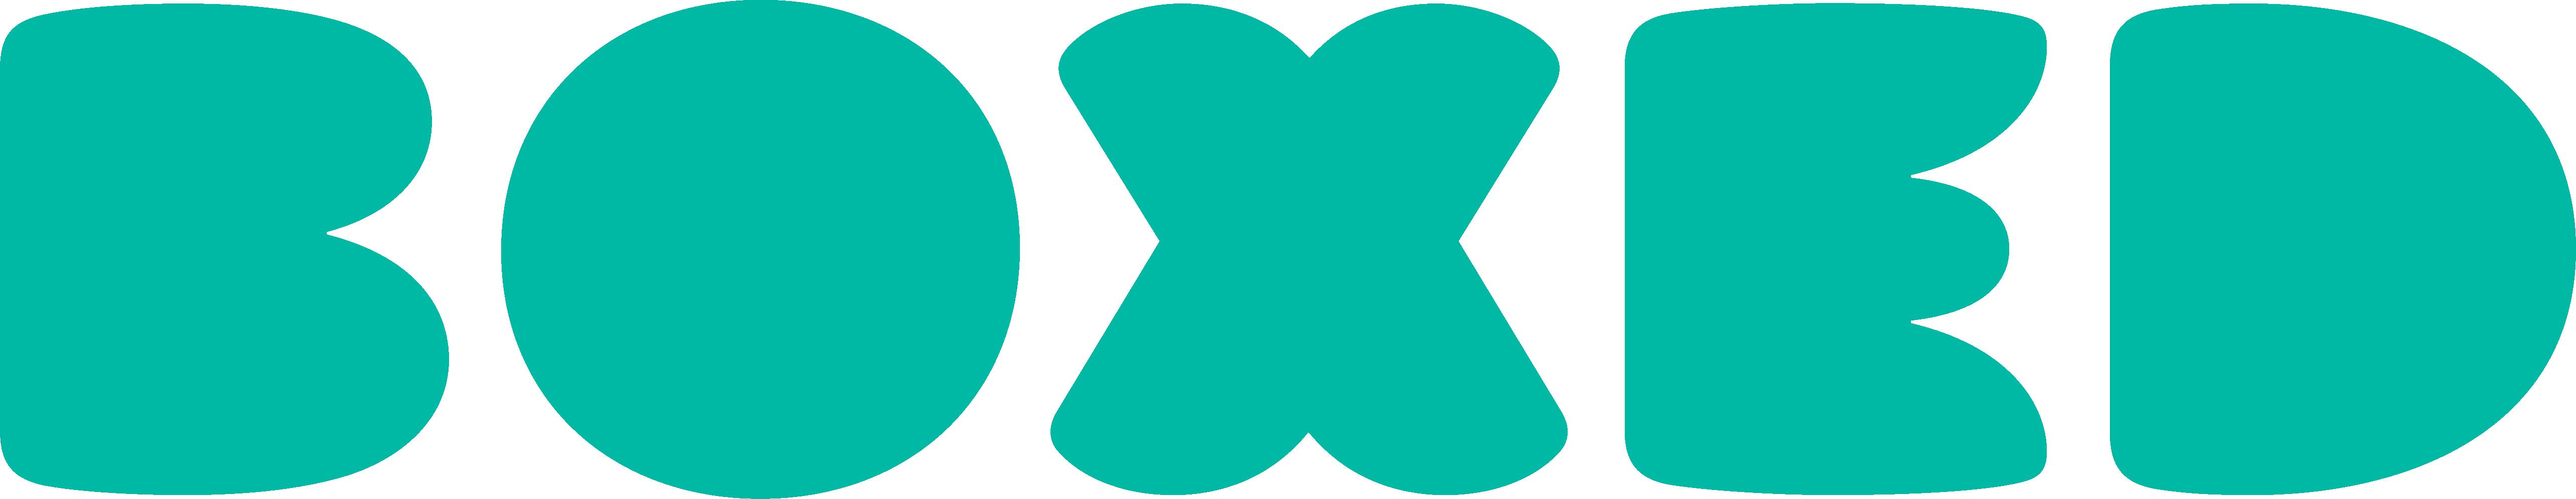 File:Boxed.Logo.Green.RGB.png.